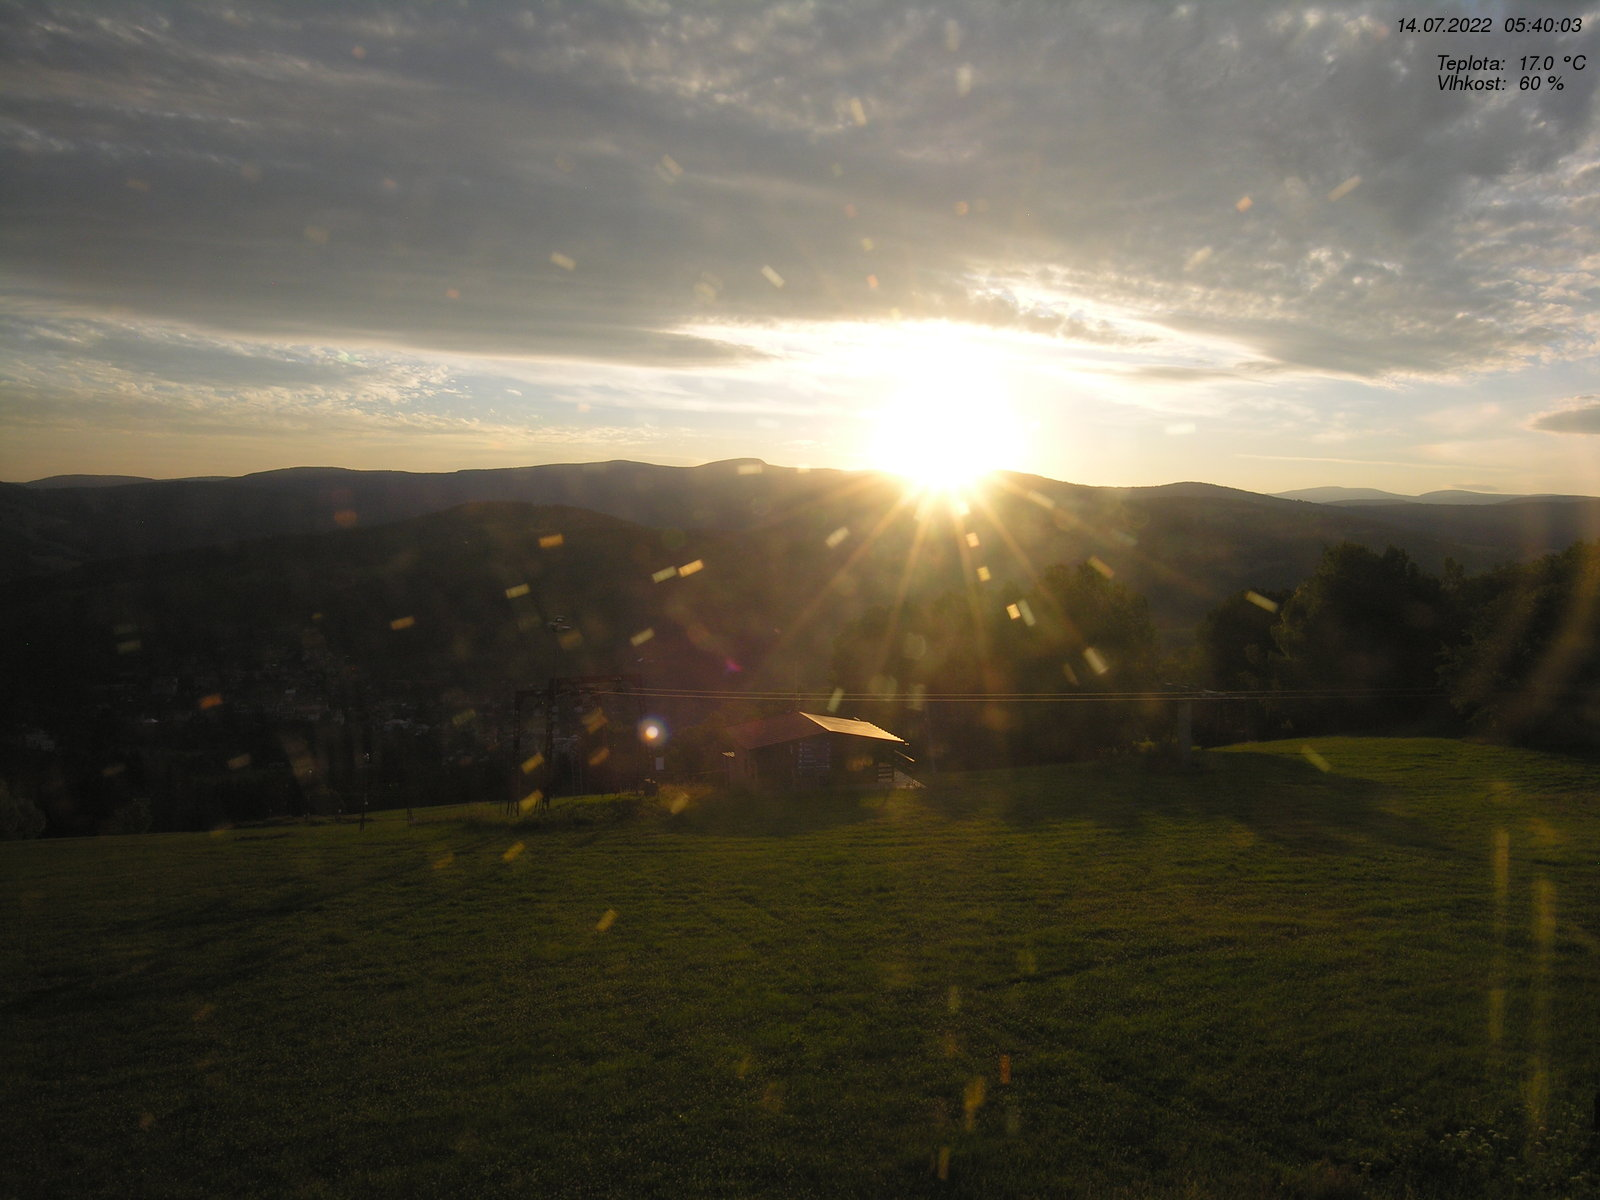 Webcam Skigebiet Rokytnice n. Jizerou Blick auf Lysa Hora & Kotel - Riesengebirge